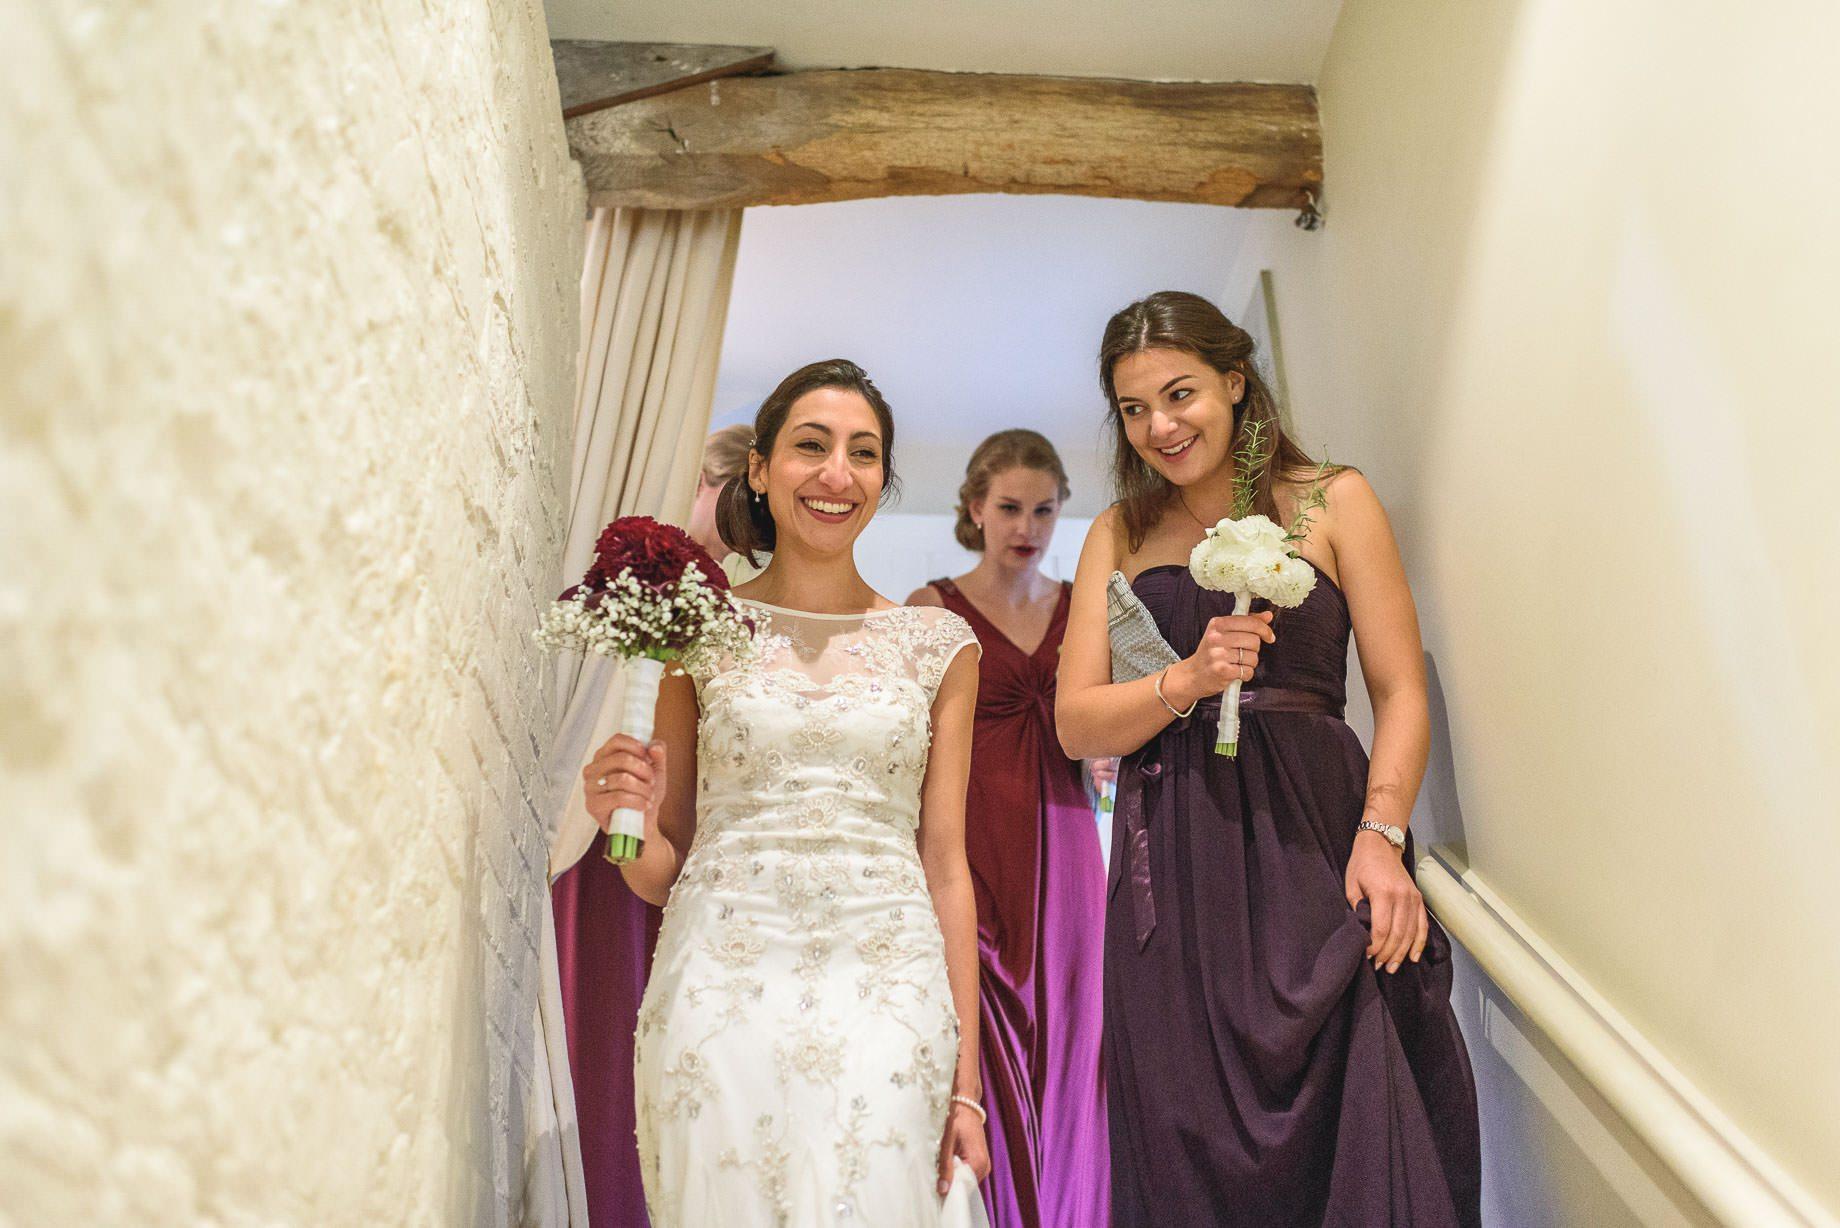 bury-court-barn-wedding-photography-guy-collier-photography-nadia-tom-45-of-184